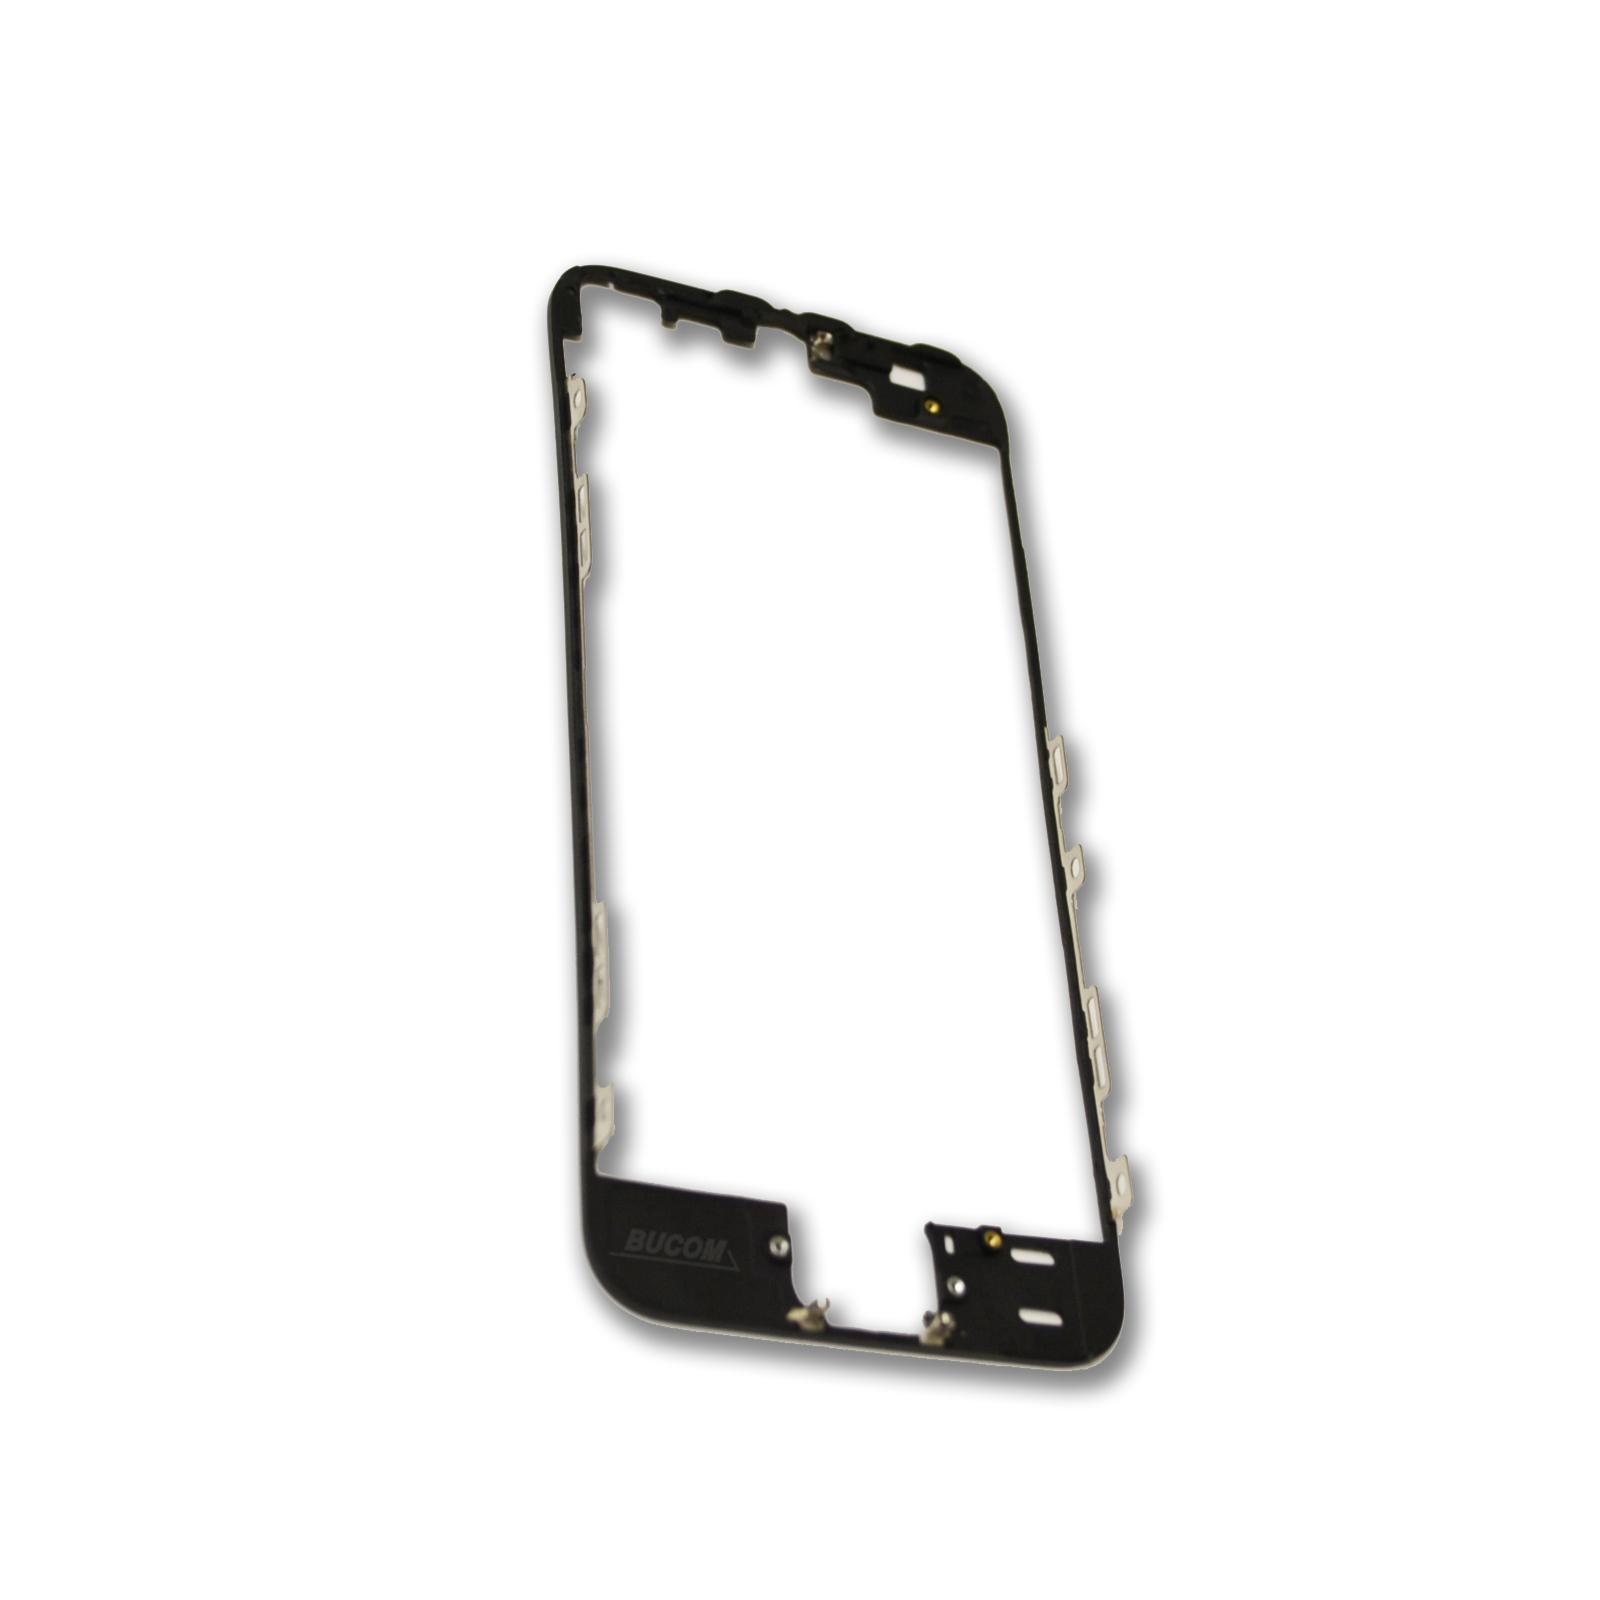 PC-LAPTOP-CENTER.COM - Iphone 5 Touchscreen LCD Rahmen middle Frame ...